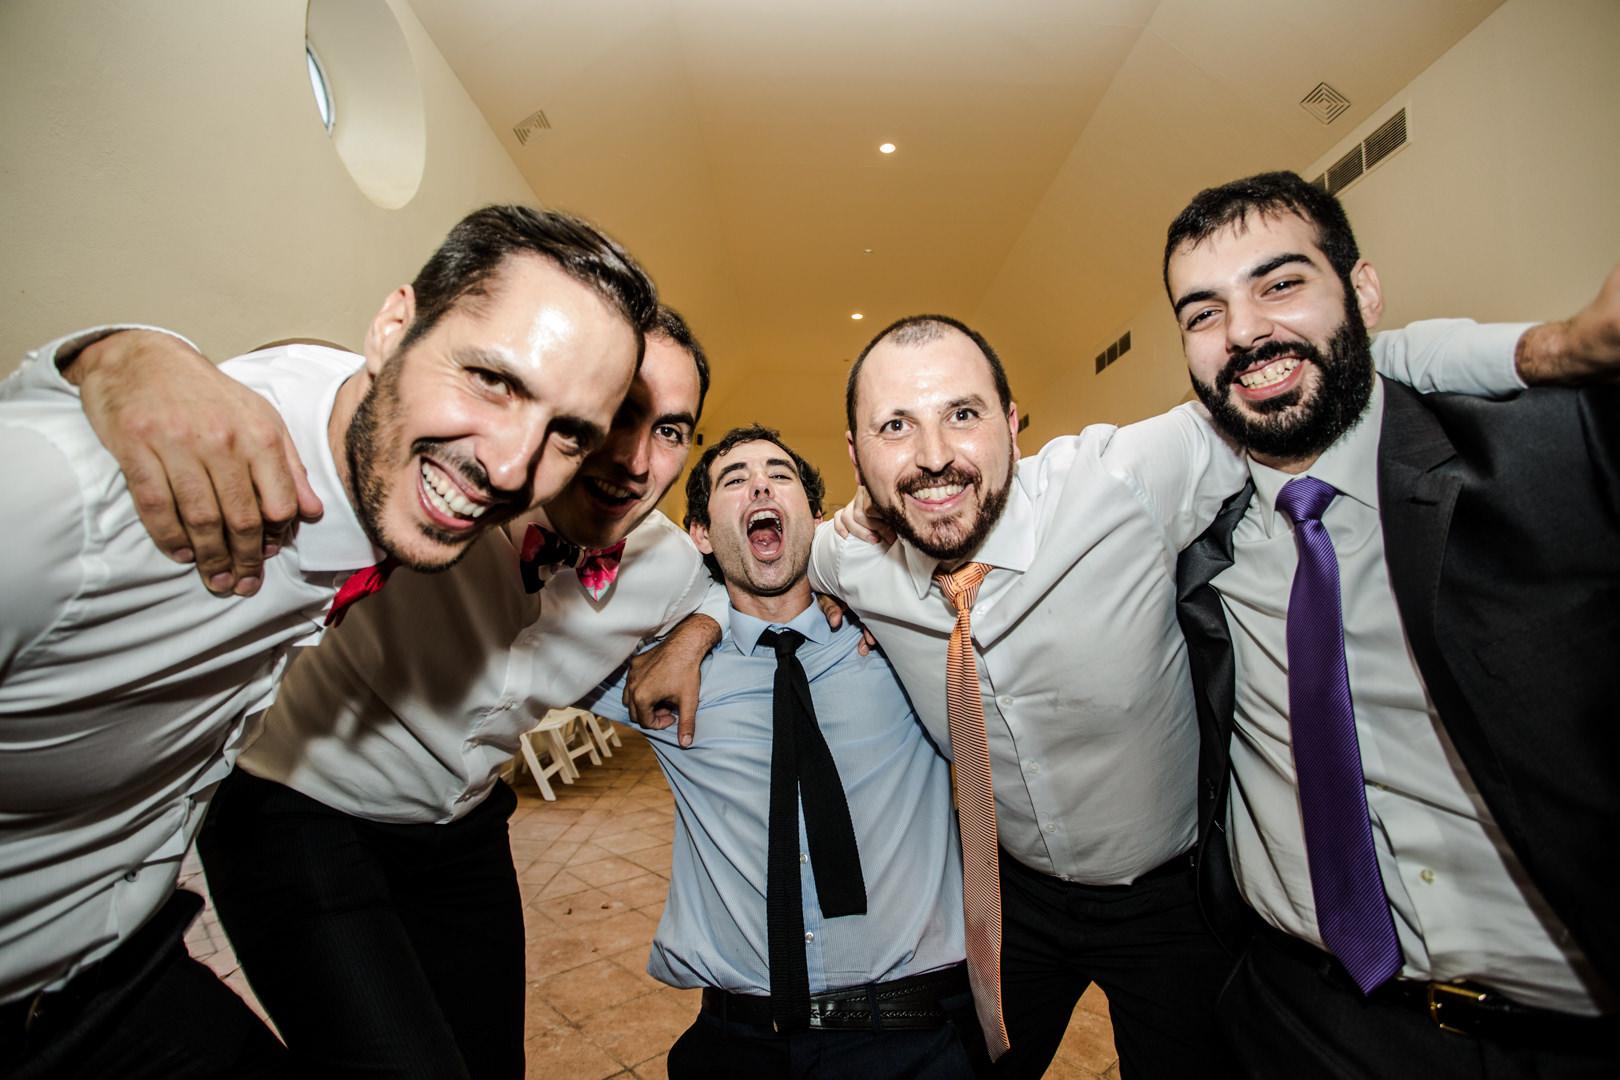 Boda-Hacienda-LOrigen-Pepe-Maria-engagement-Rafael-Torres-fotografo-bodas-sevilla-madrid-barcelona-wedding-photographer--31.jpg